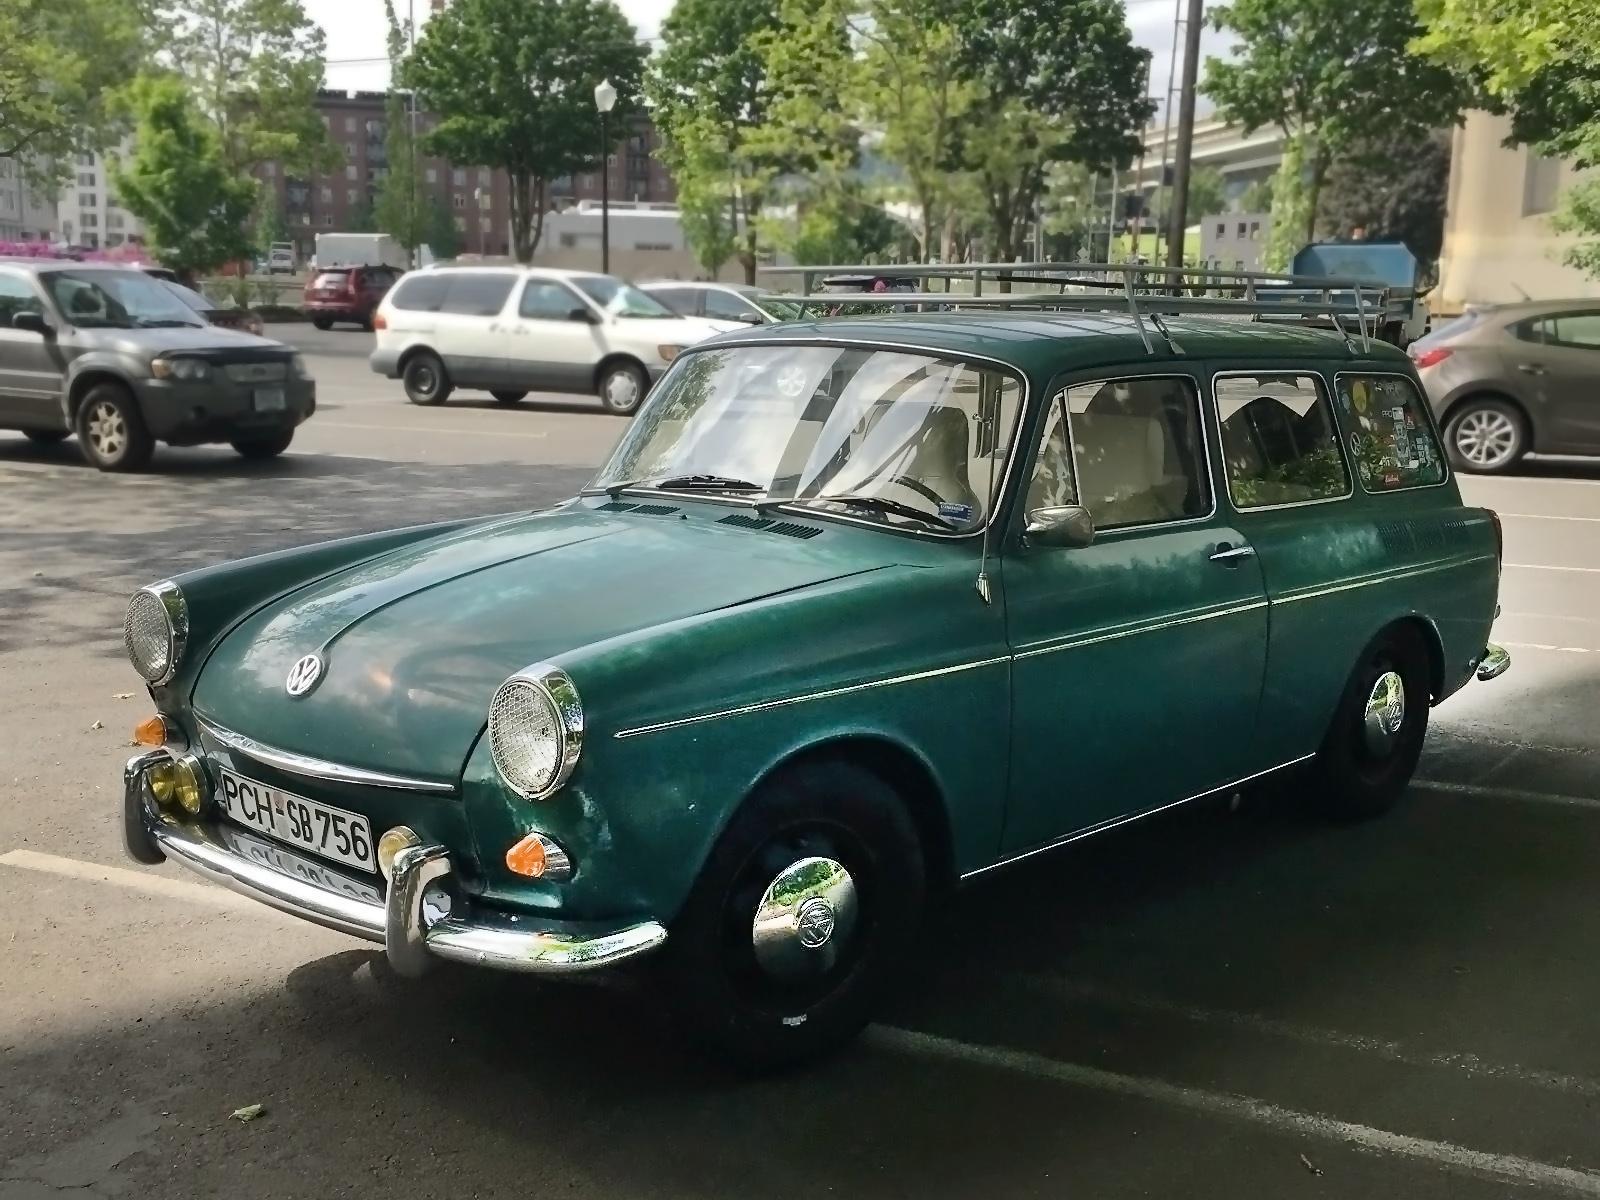 Original VDub: 1968 Volkswagen Type 3 Squareback